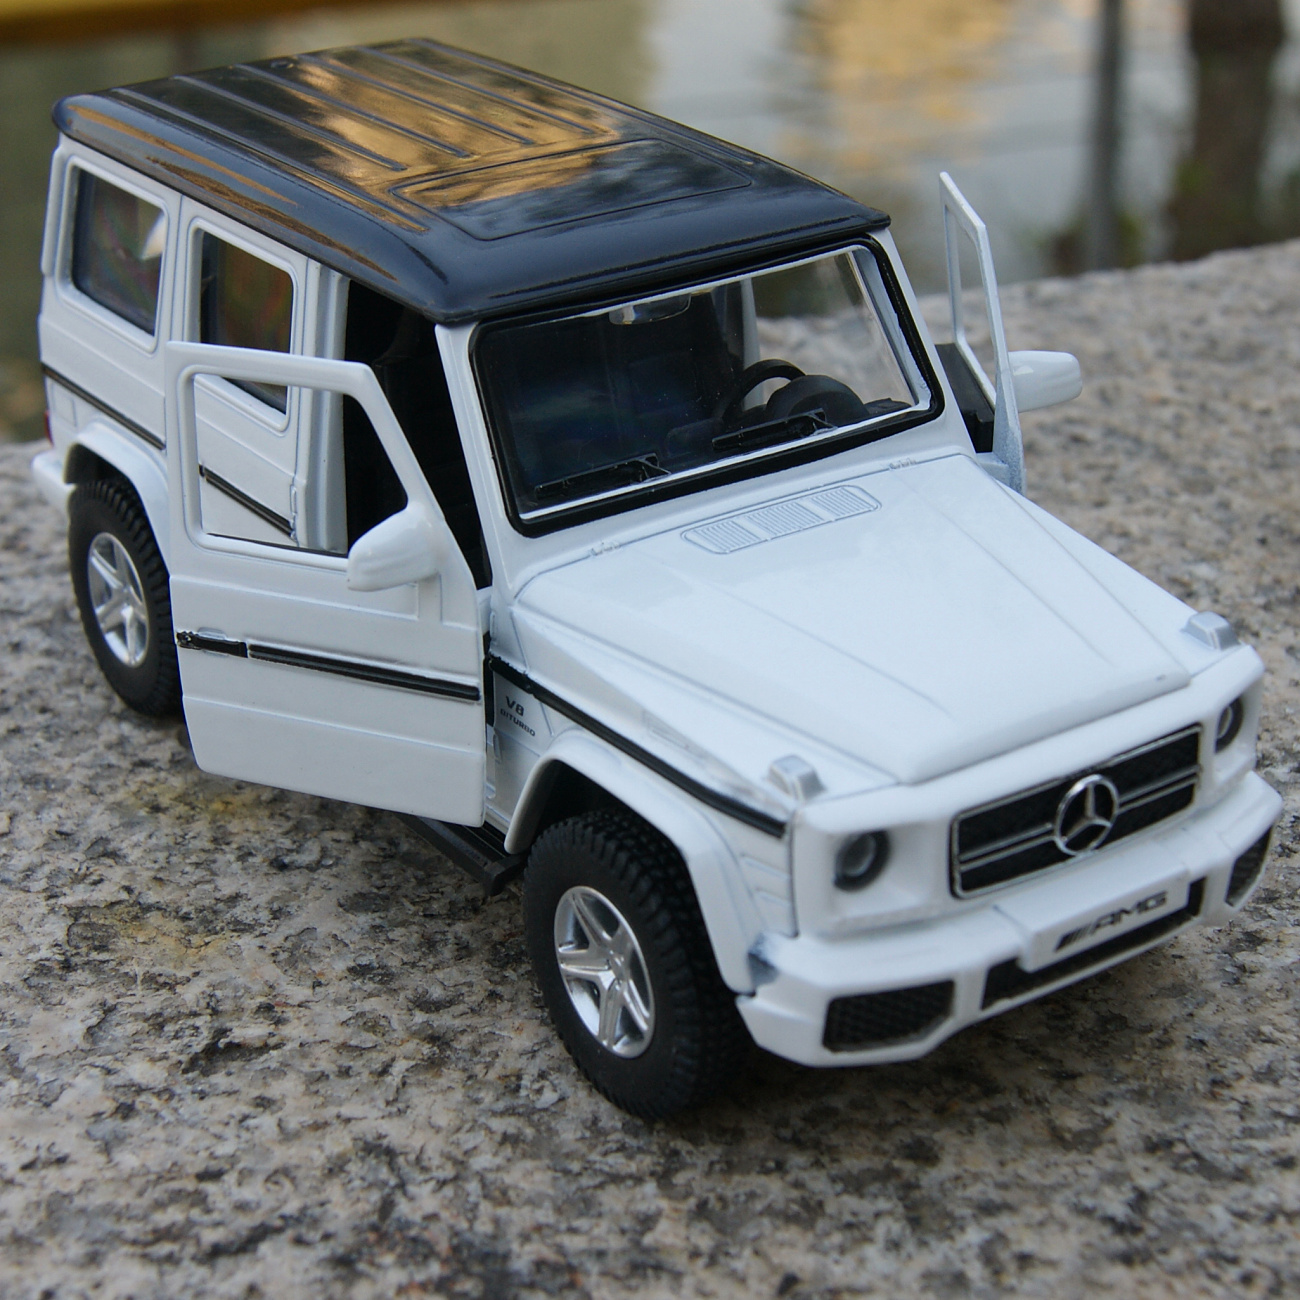 alloy diecast model cars mercedes benz g63 amg pull back 1 35 toys gifts white ebay. Black Bedroom Furniture Sets. Home Design Ideas